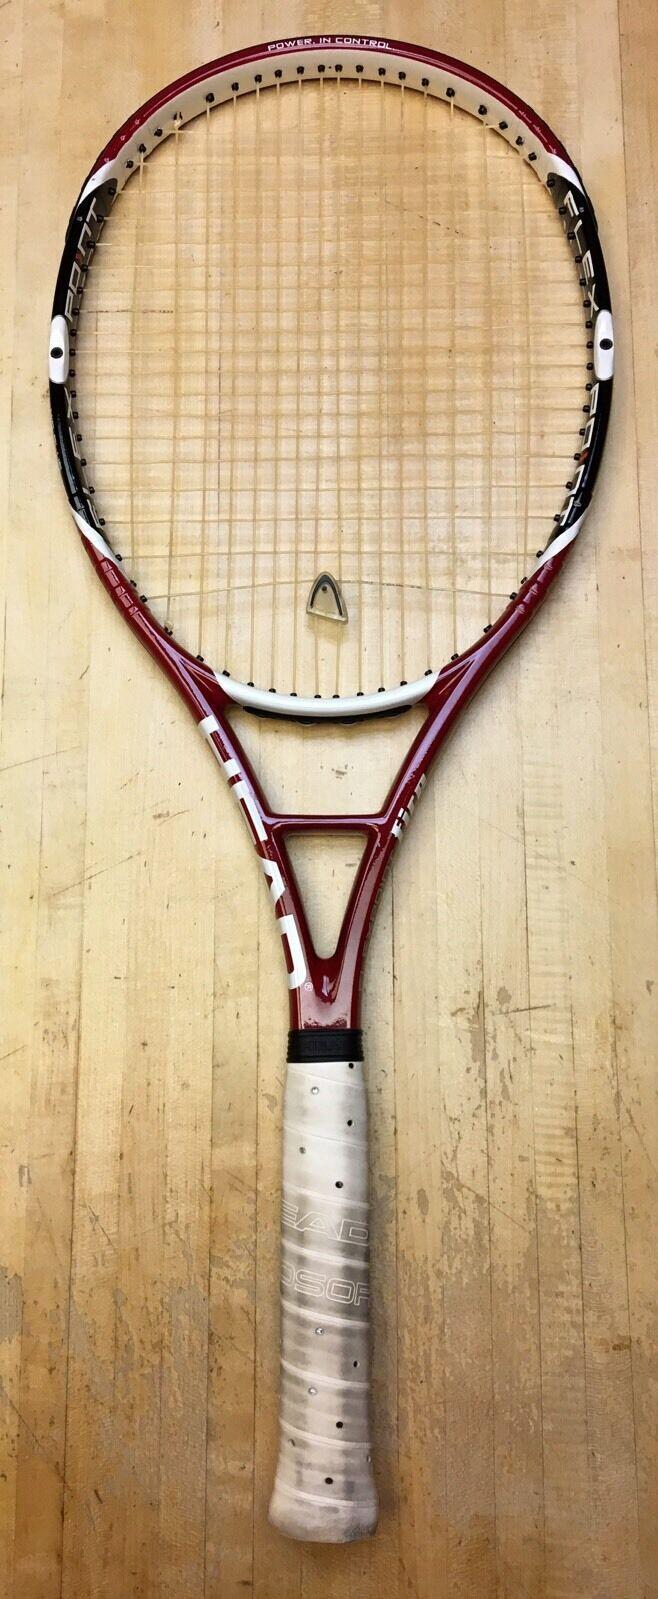 Cabeza Flexpoint fuego Mid Plus 102 tenis raqueta